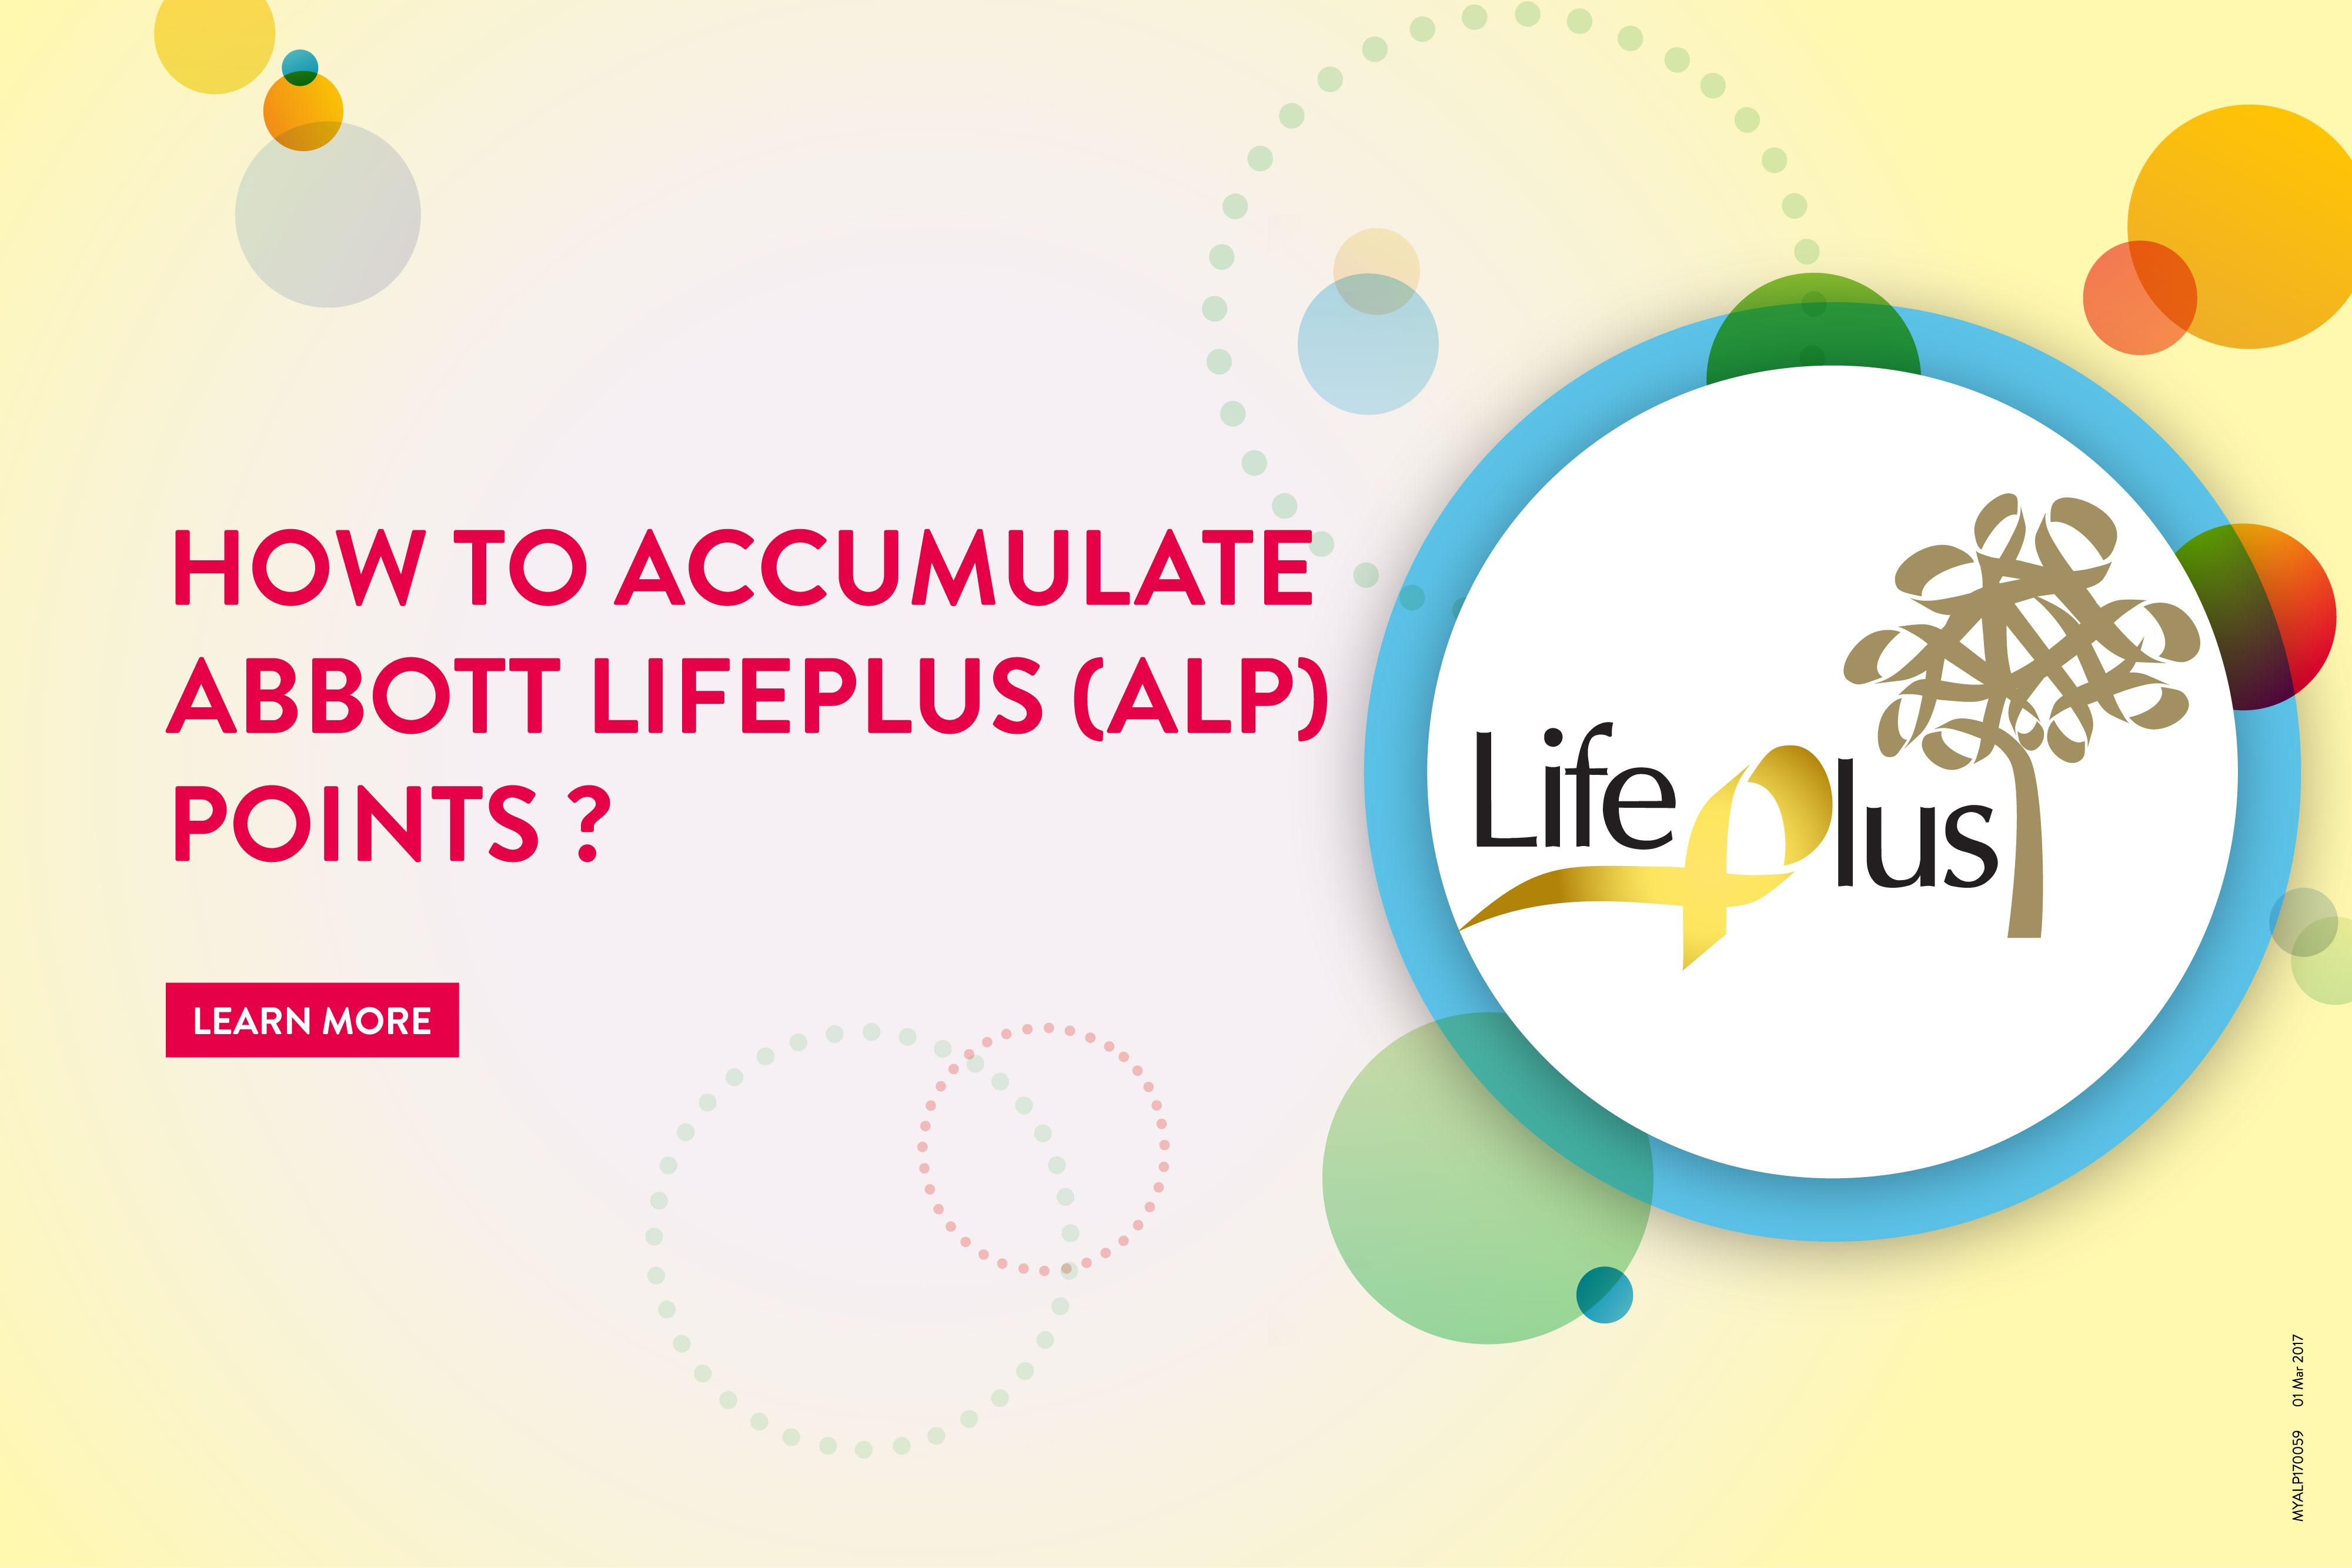 Abbott Life Plus (ALP)